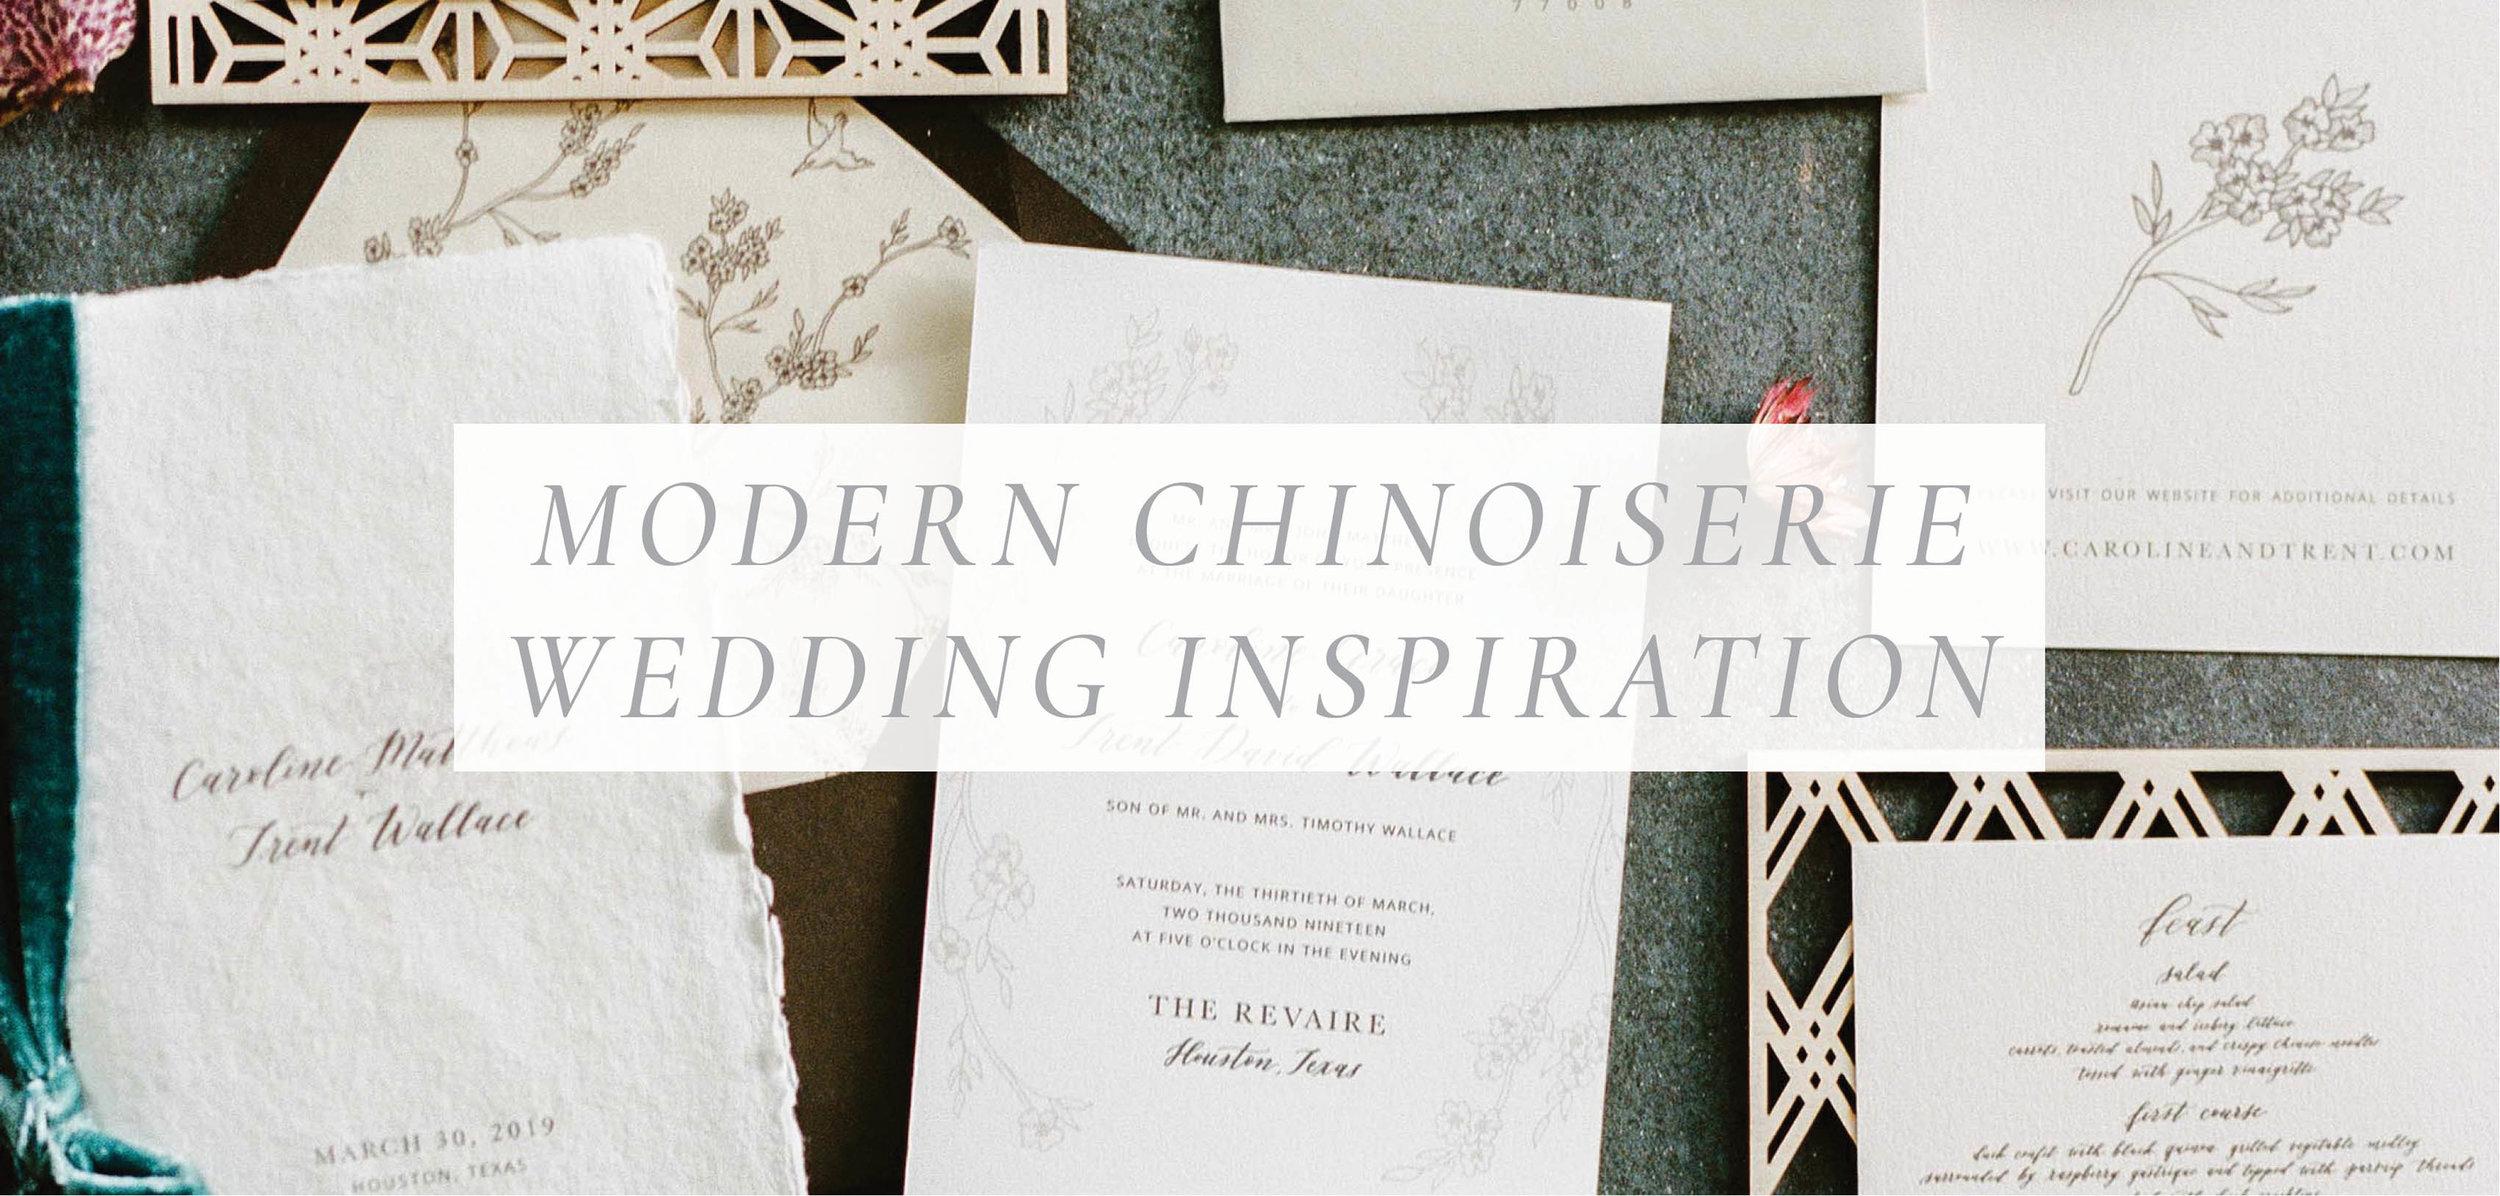 Modern Chinoiserie Wedding Inspiration.jpg